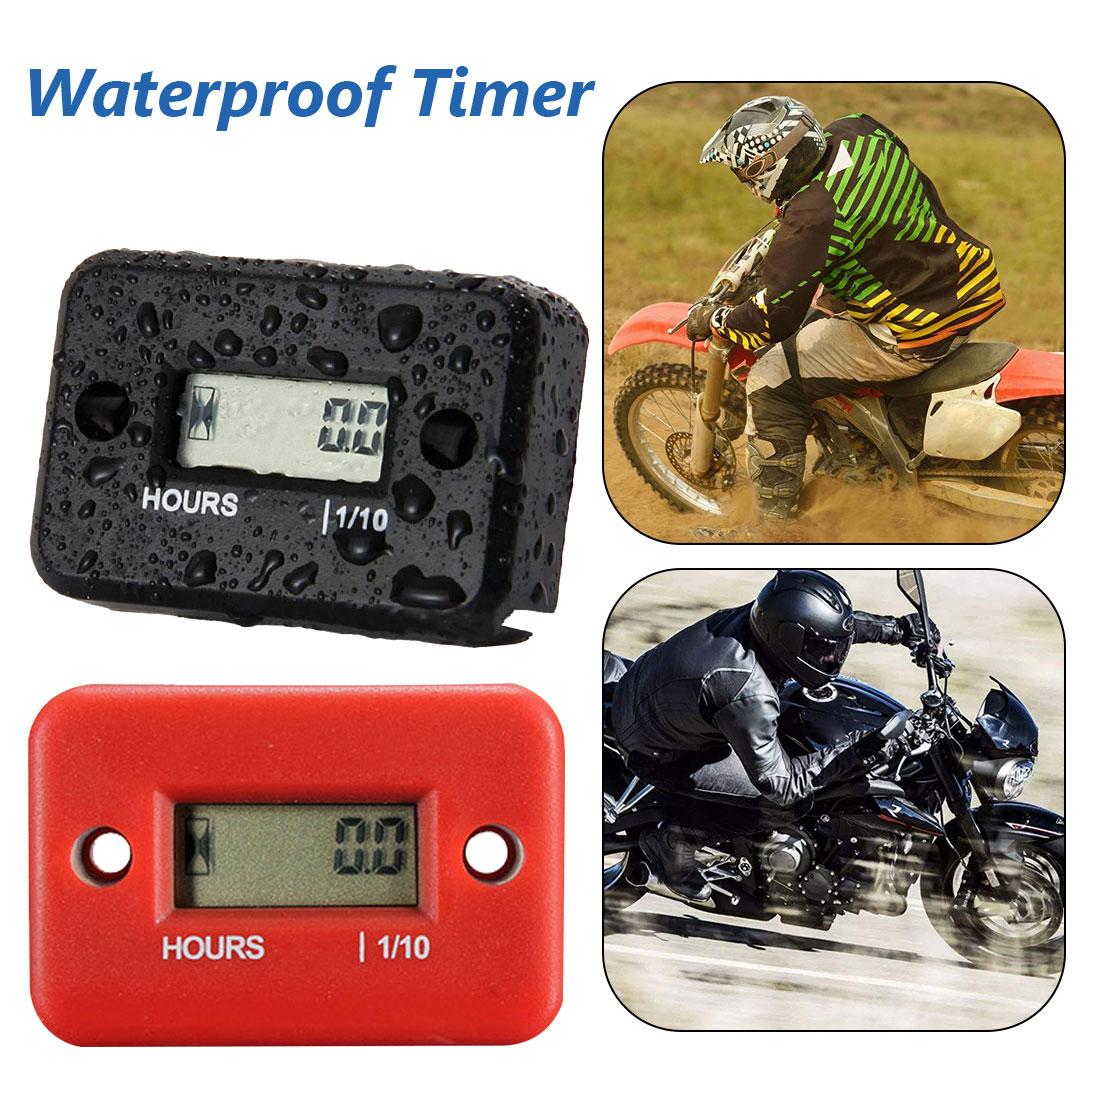 Engine Motor Hour Meter For Honda kawasaki YAMAHA Dirt Bikes Motorcycles ATV